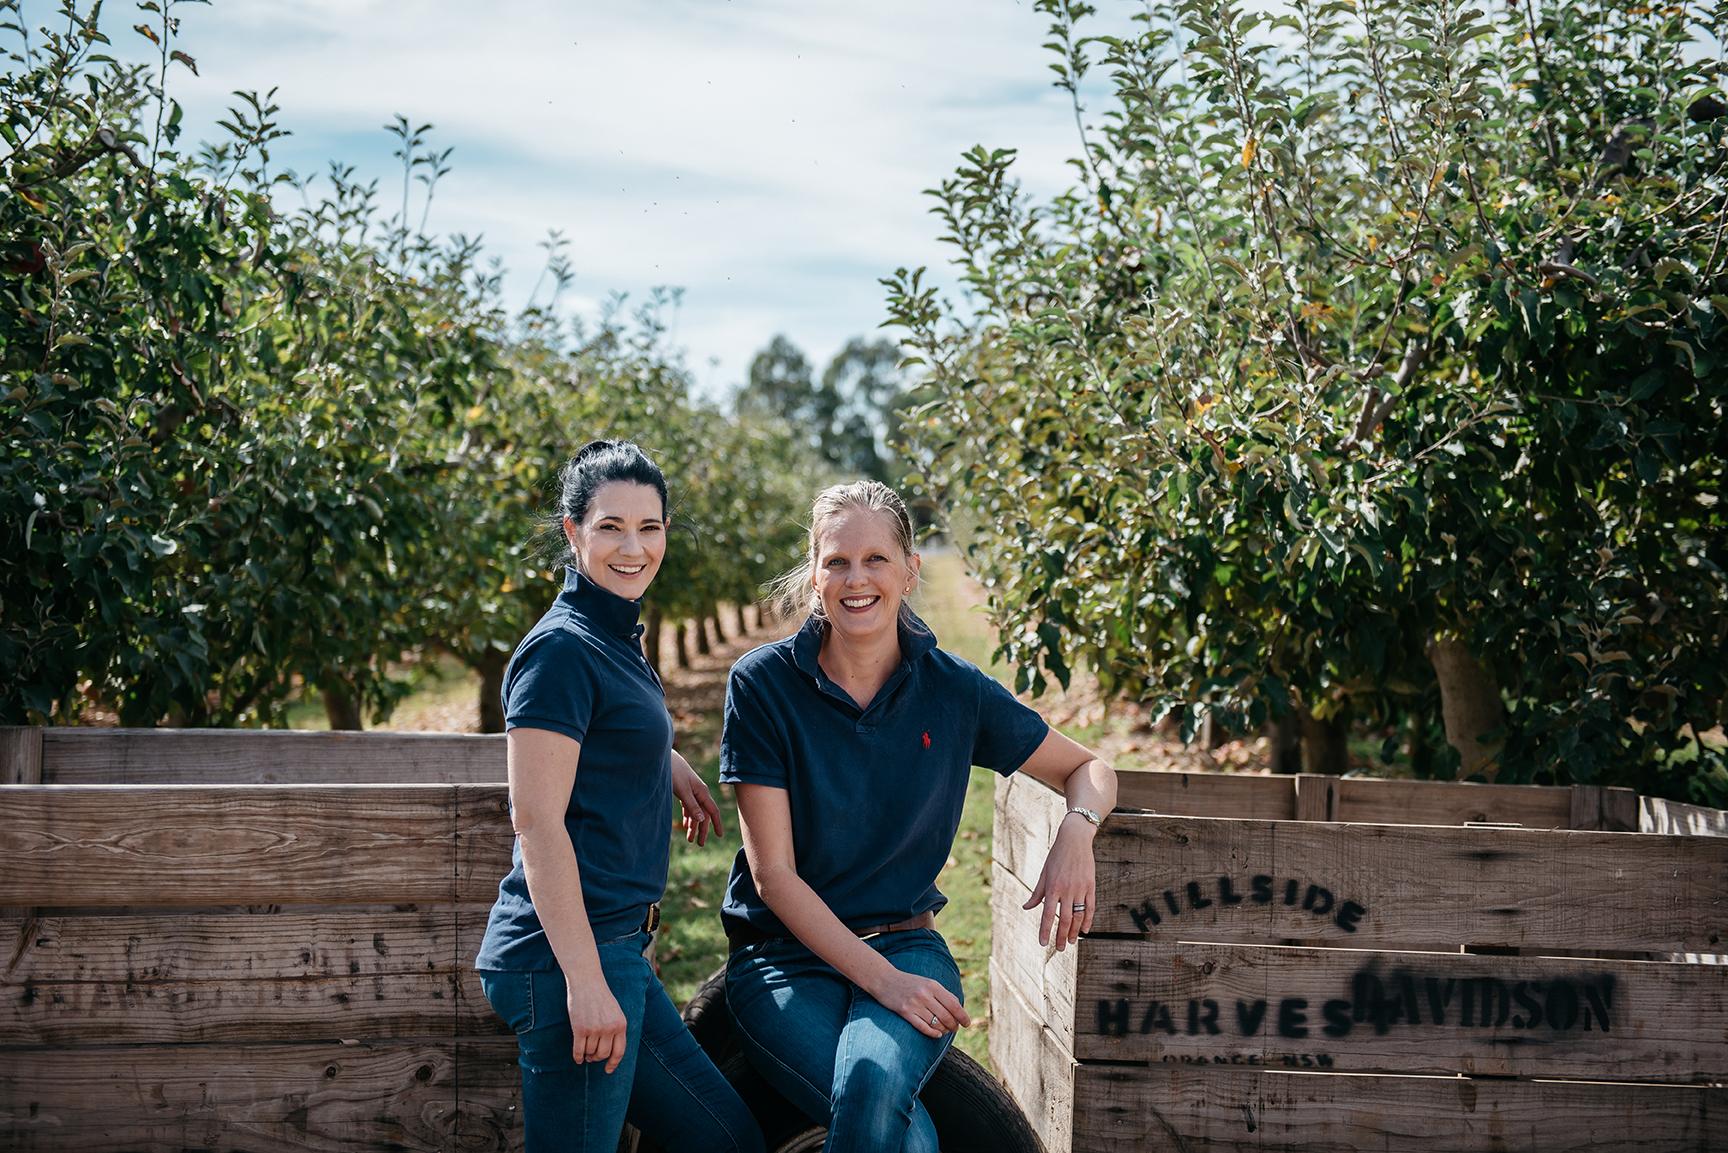 Visit My Farm Australia - Hillside Harvest, Orange NSW